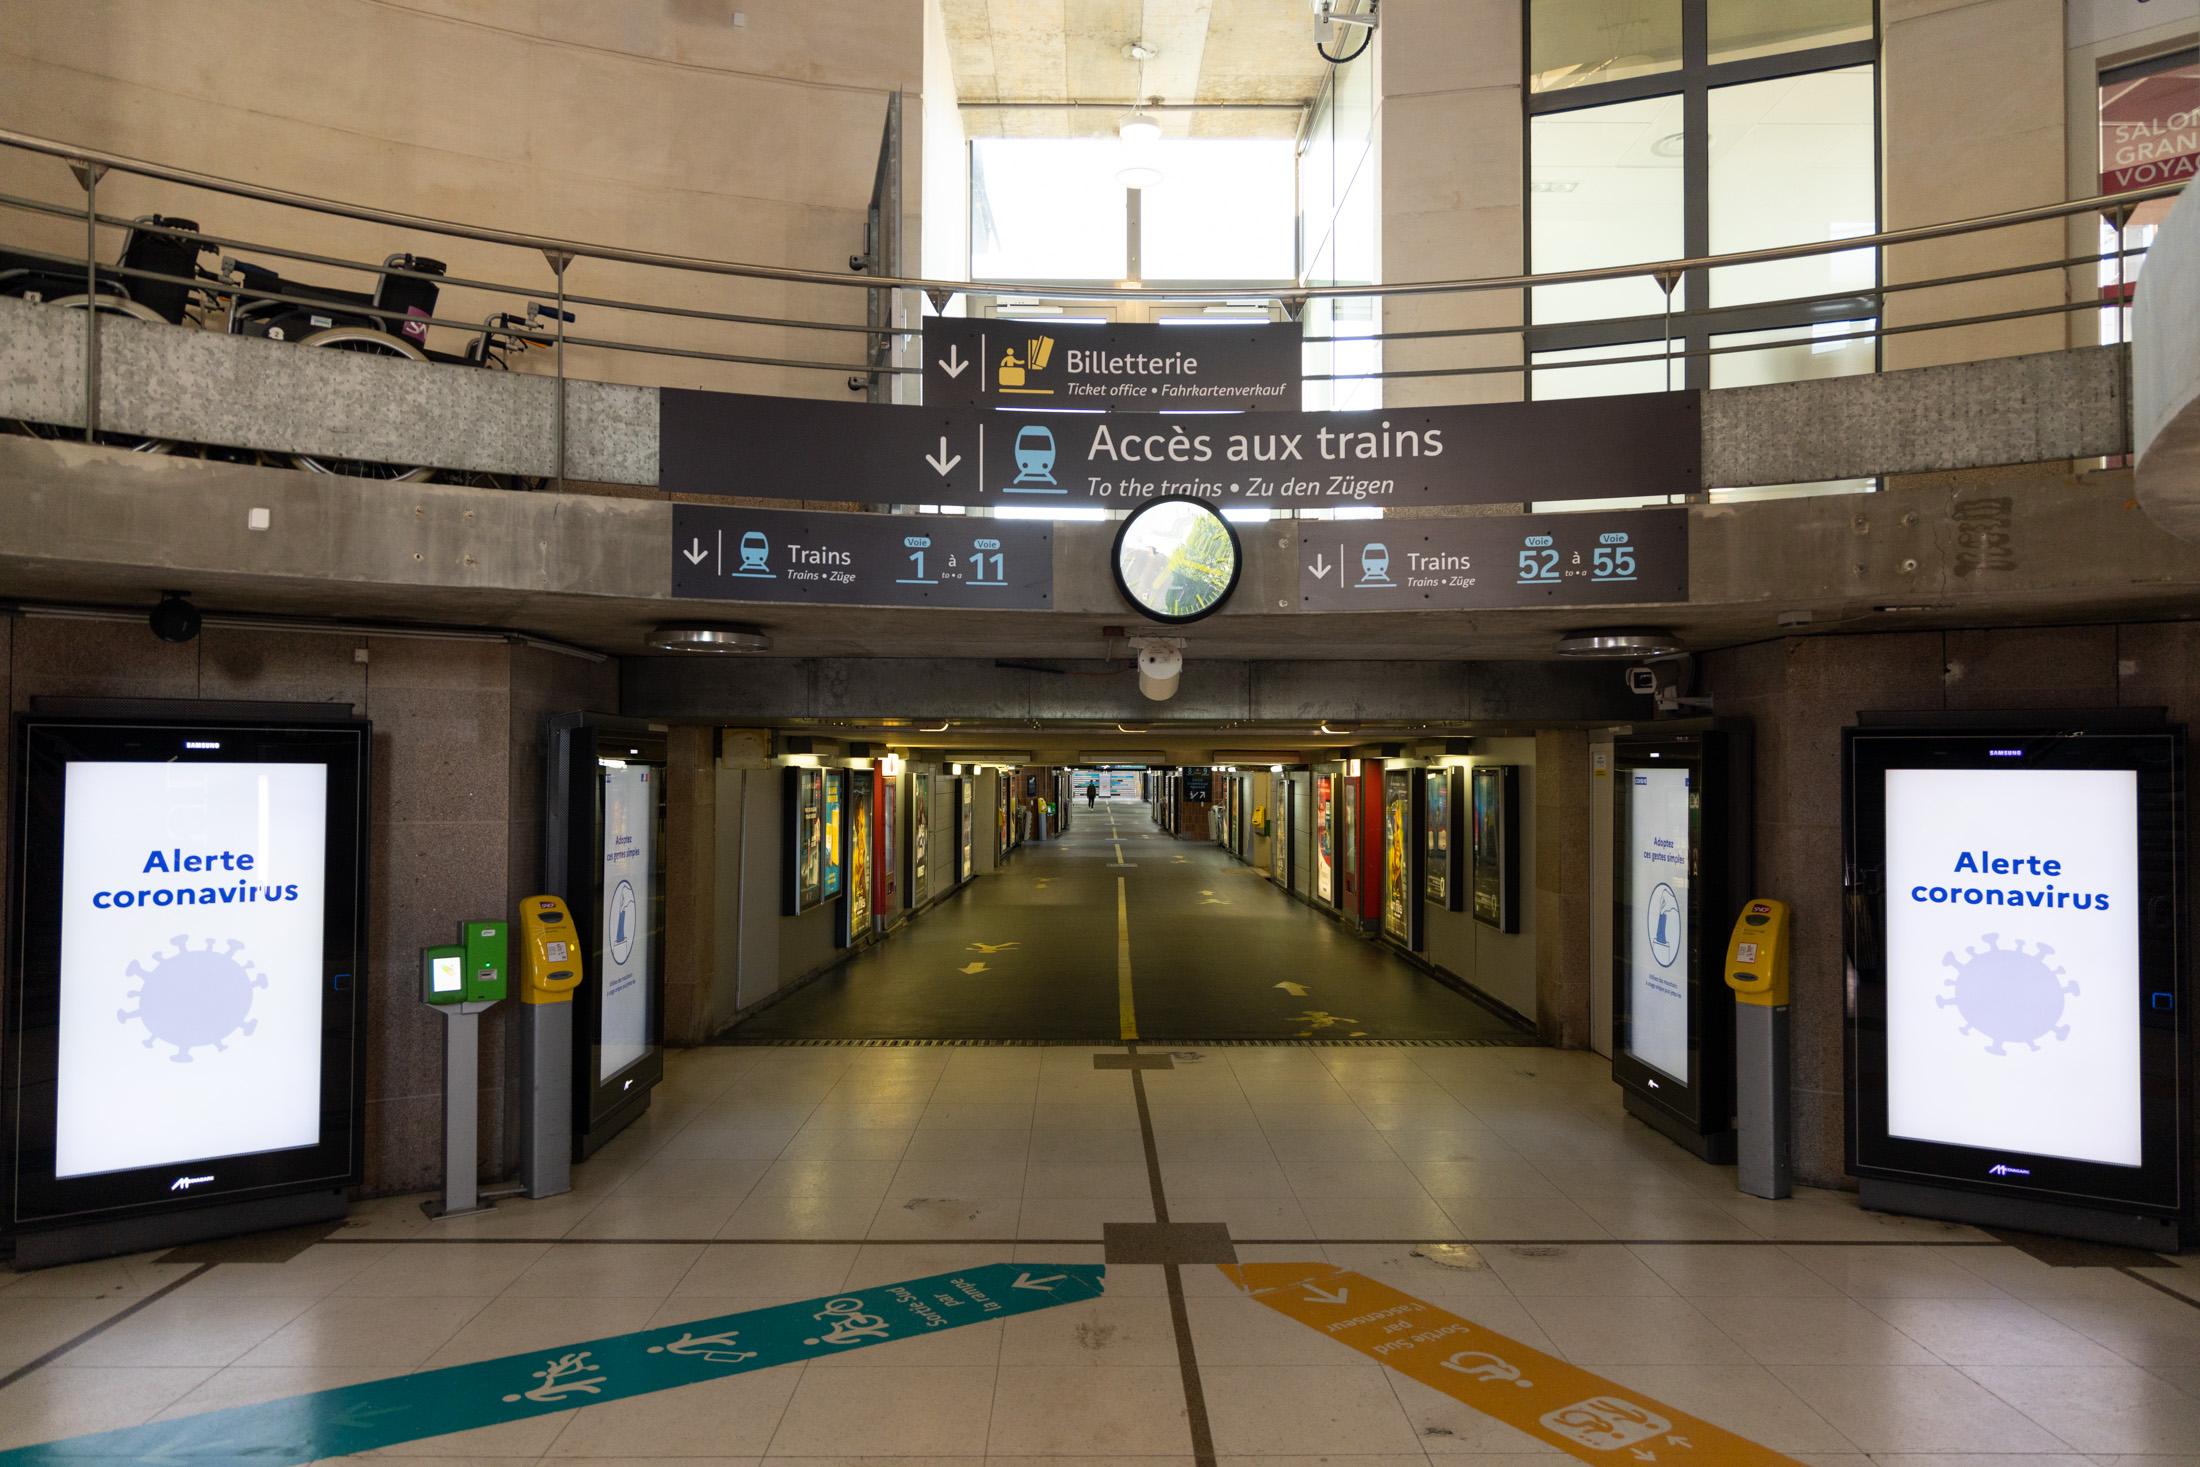 Nantes empty railroad station. Nantes, France - April 24th 2020.La gare de Nantes vide. Nantes, France - 24 avril 2020.